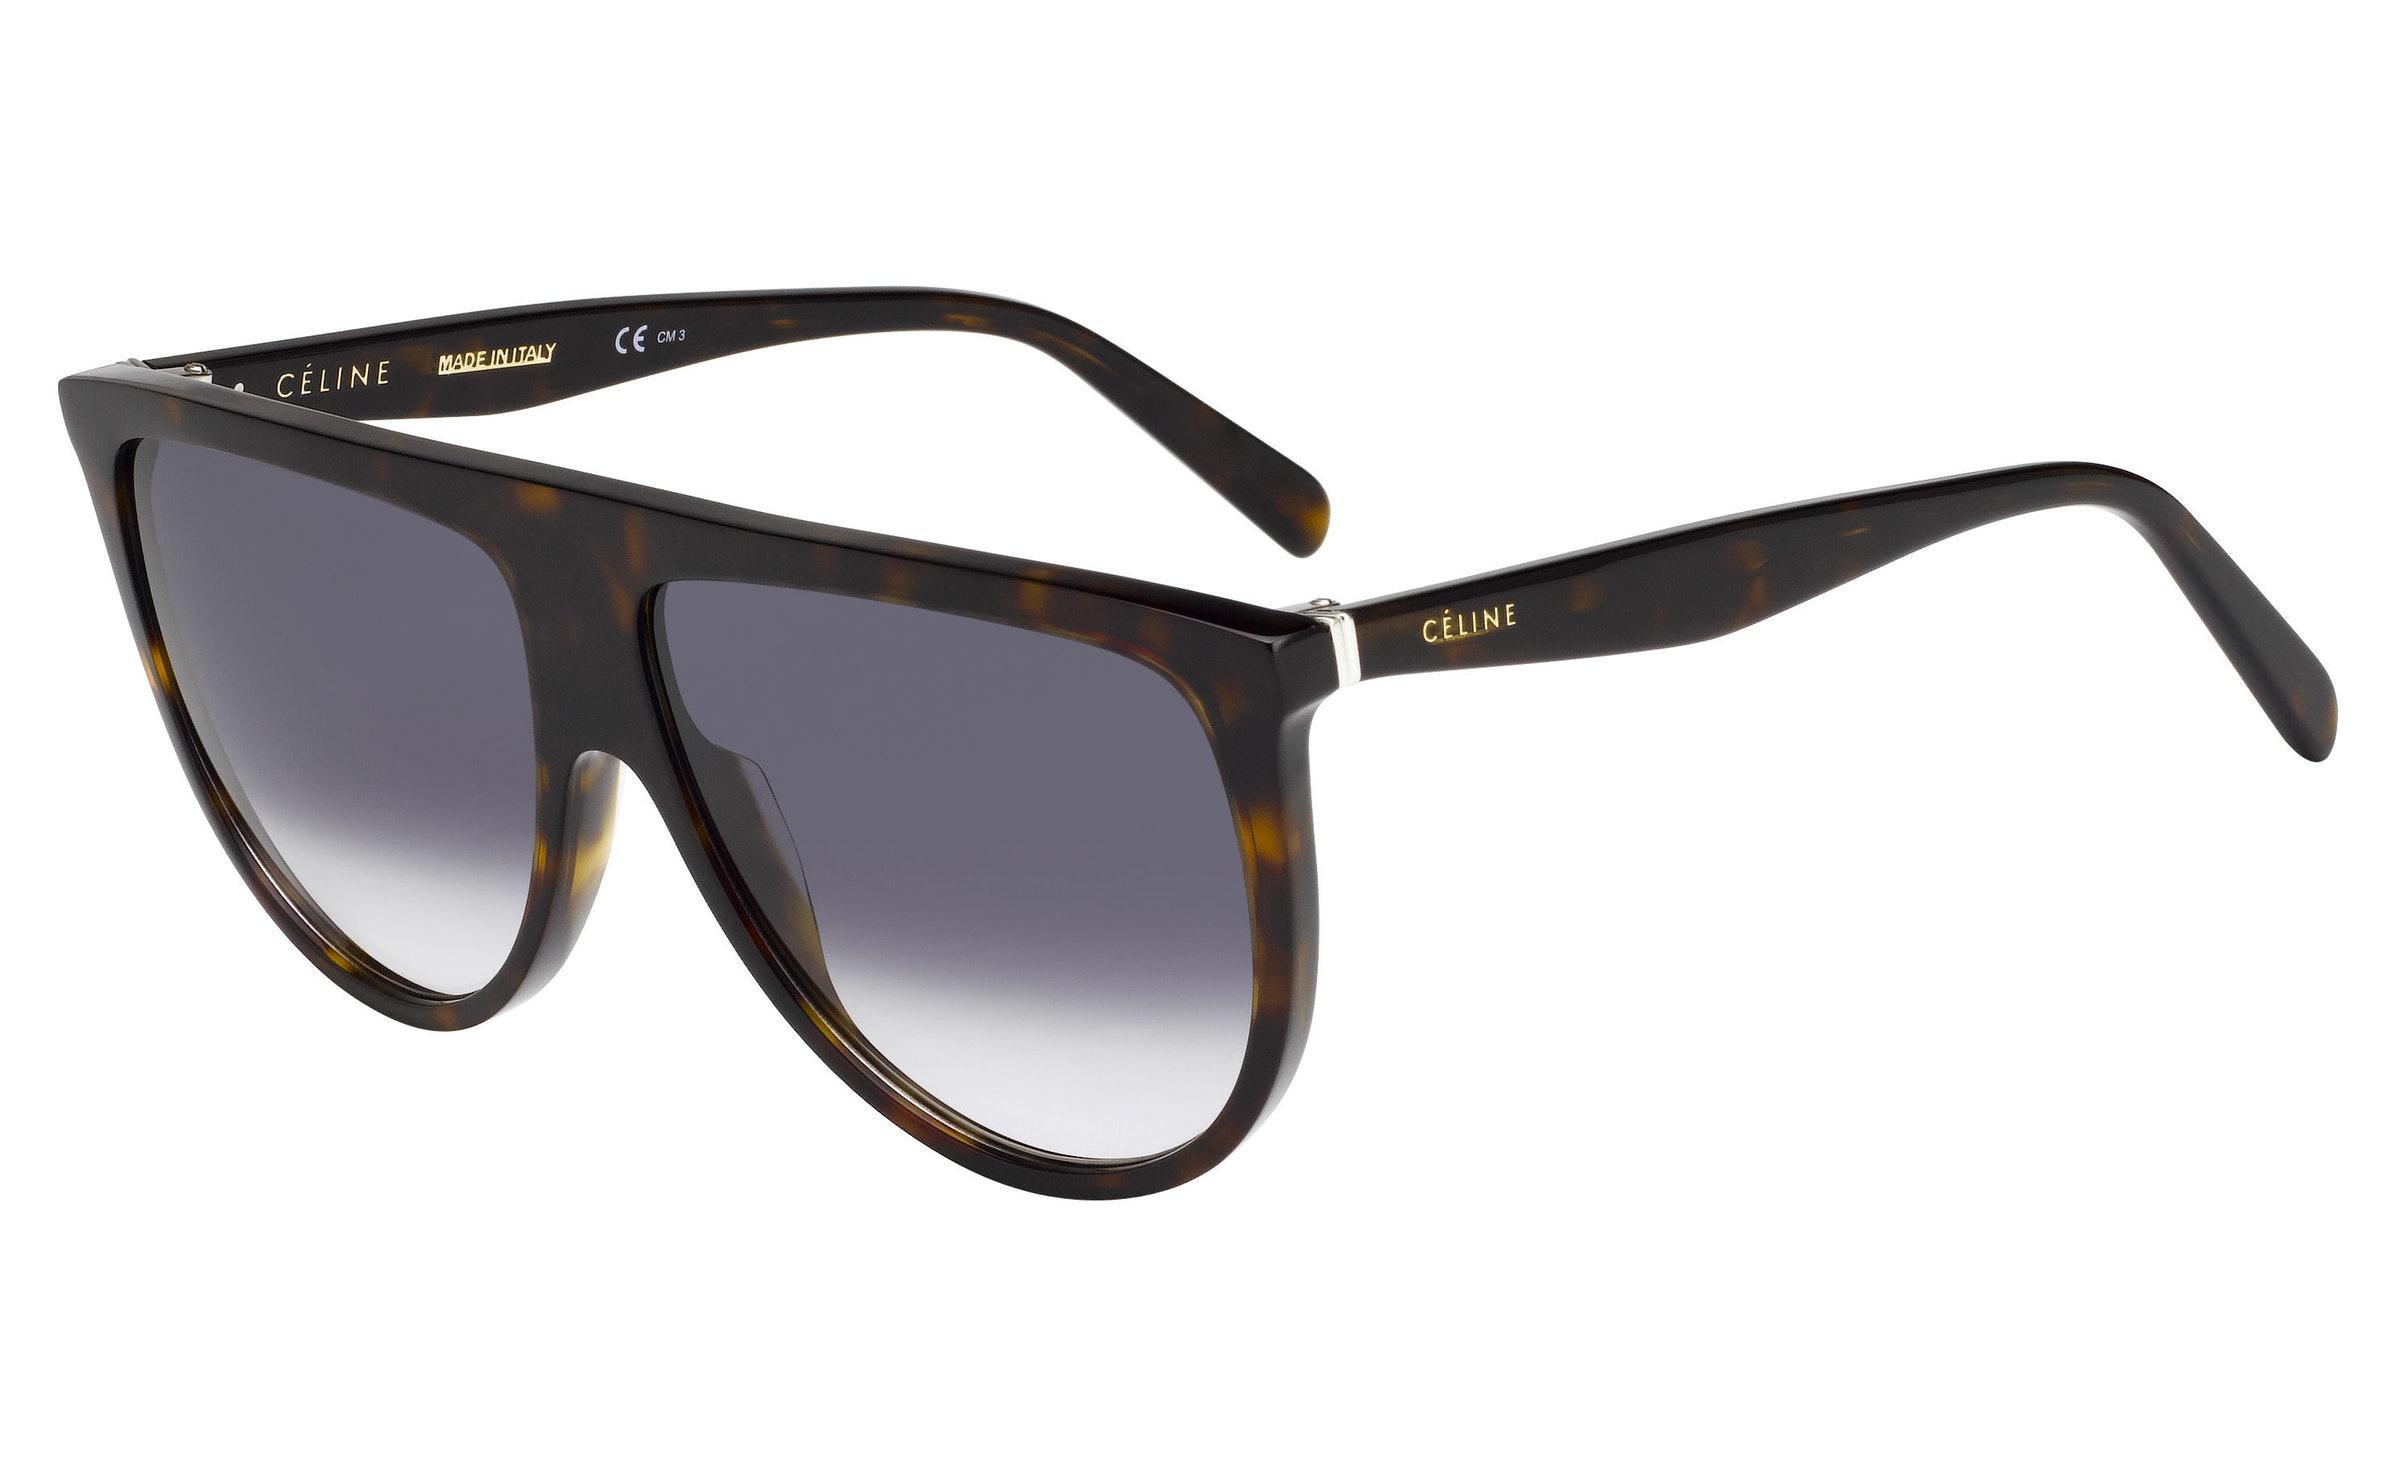 83ae6ebcf345 Lyst - Céline Thin Shadow 41435 Shield Sunglasses in Black